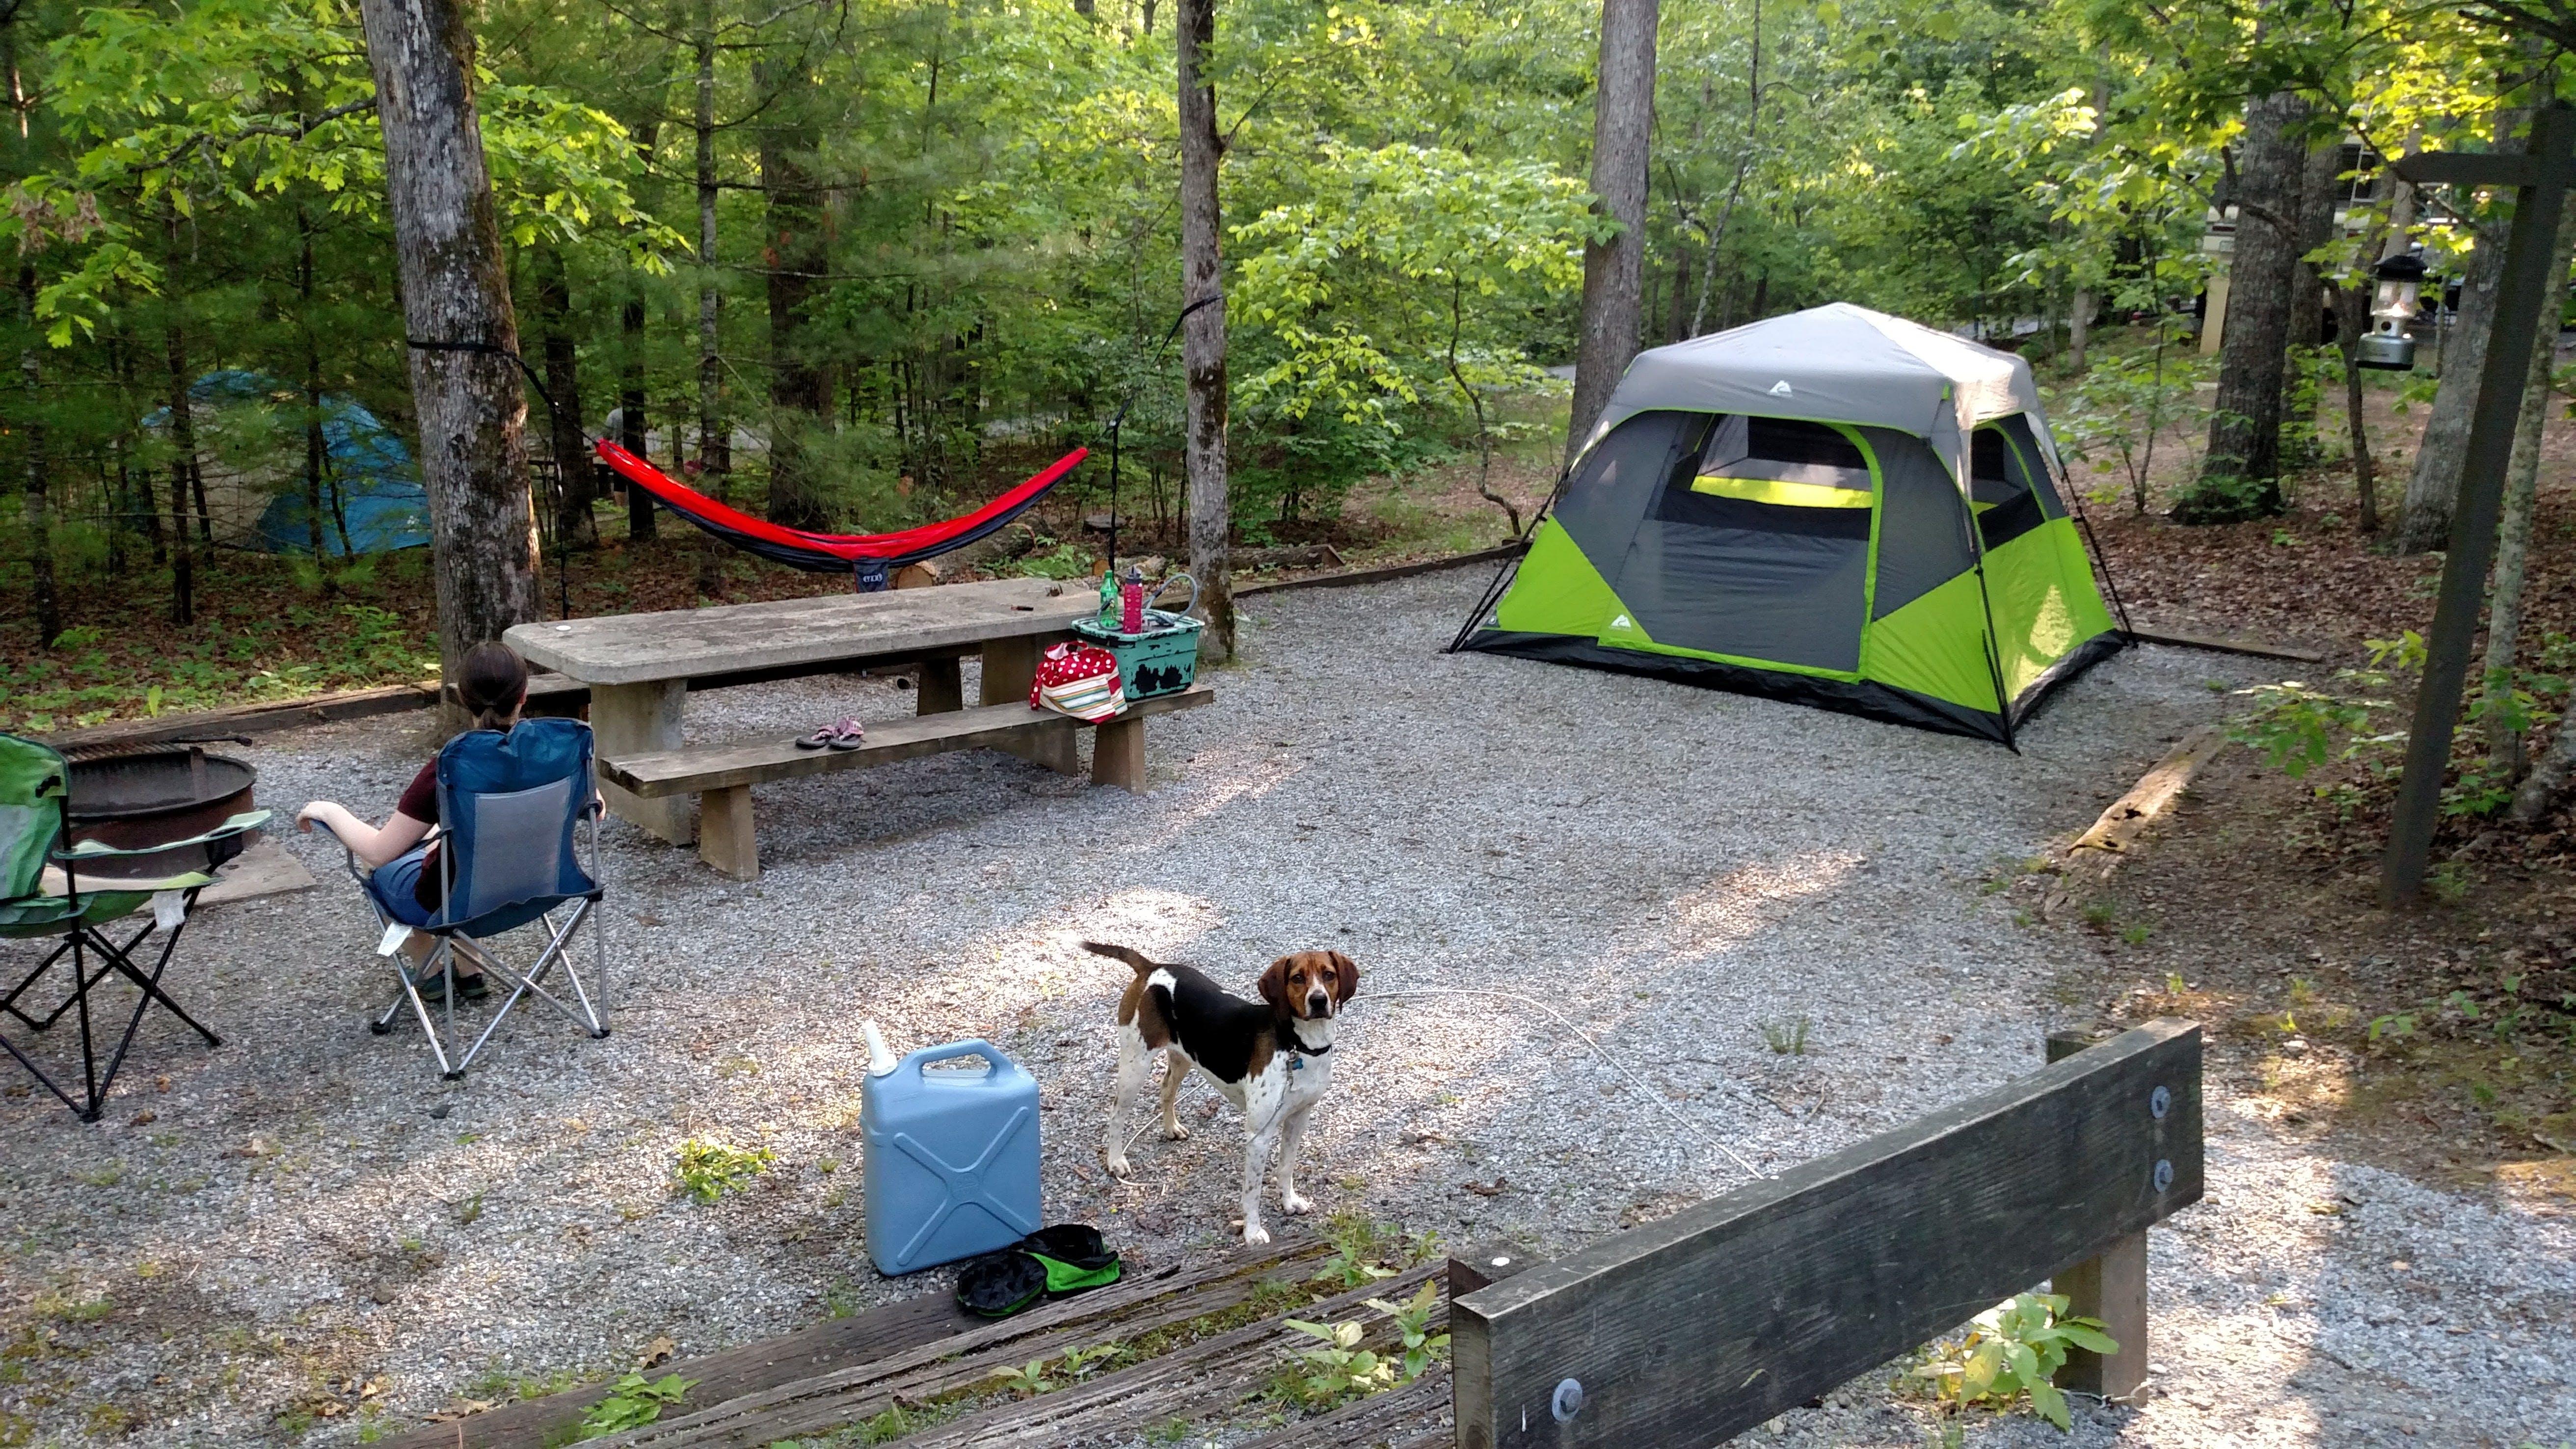 Lake Powhatan Campground, NC | The Dyrt